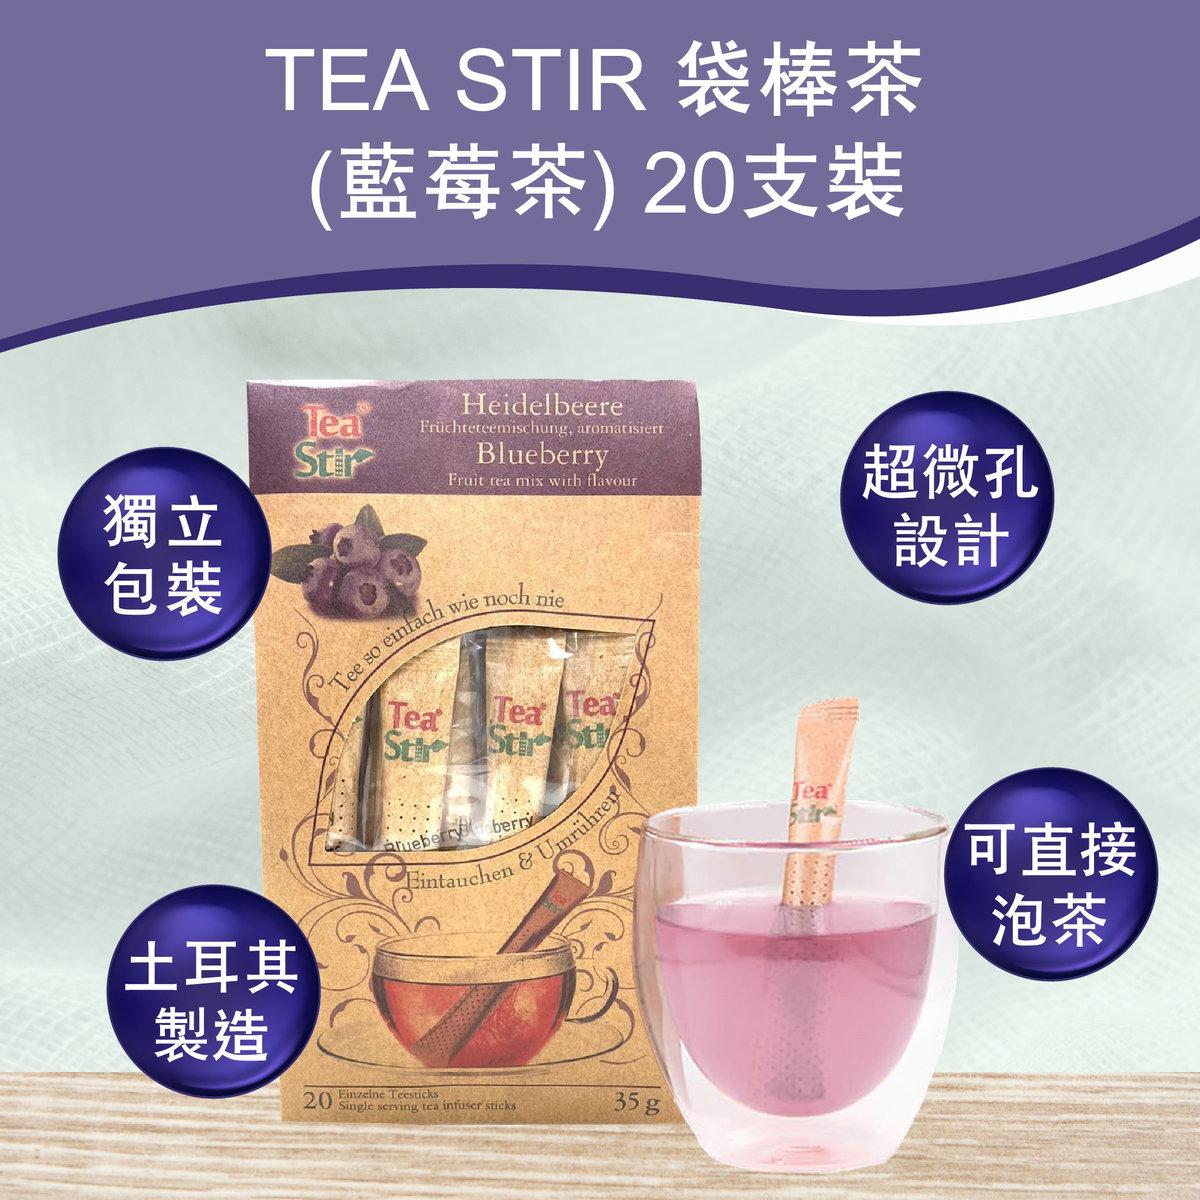 Tea Stir (Blueberry Tea) 20pcs 35g Tea Stick